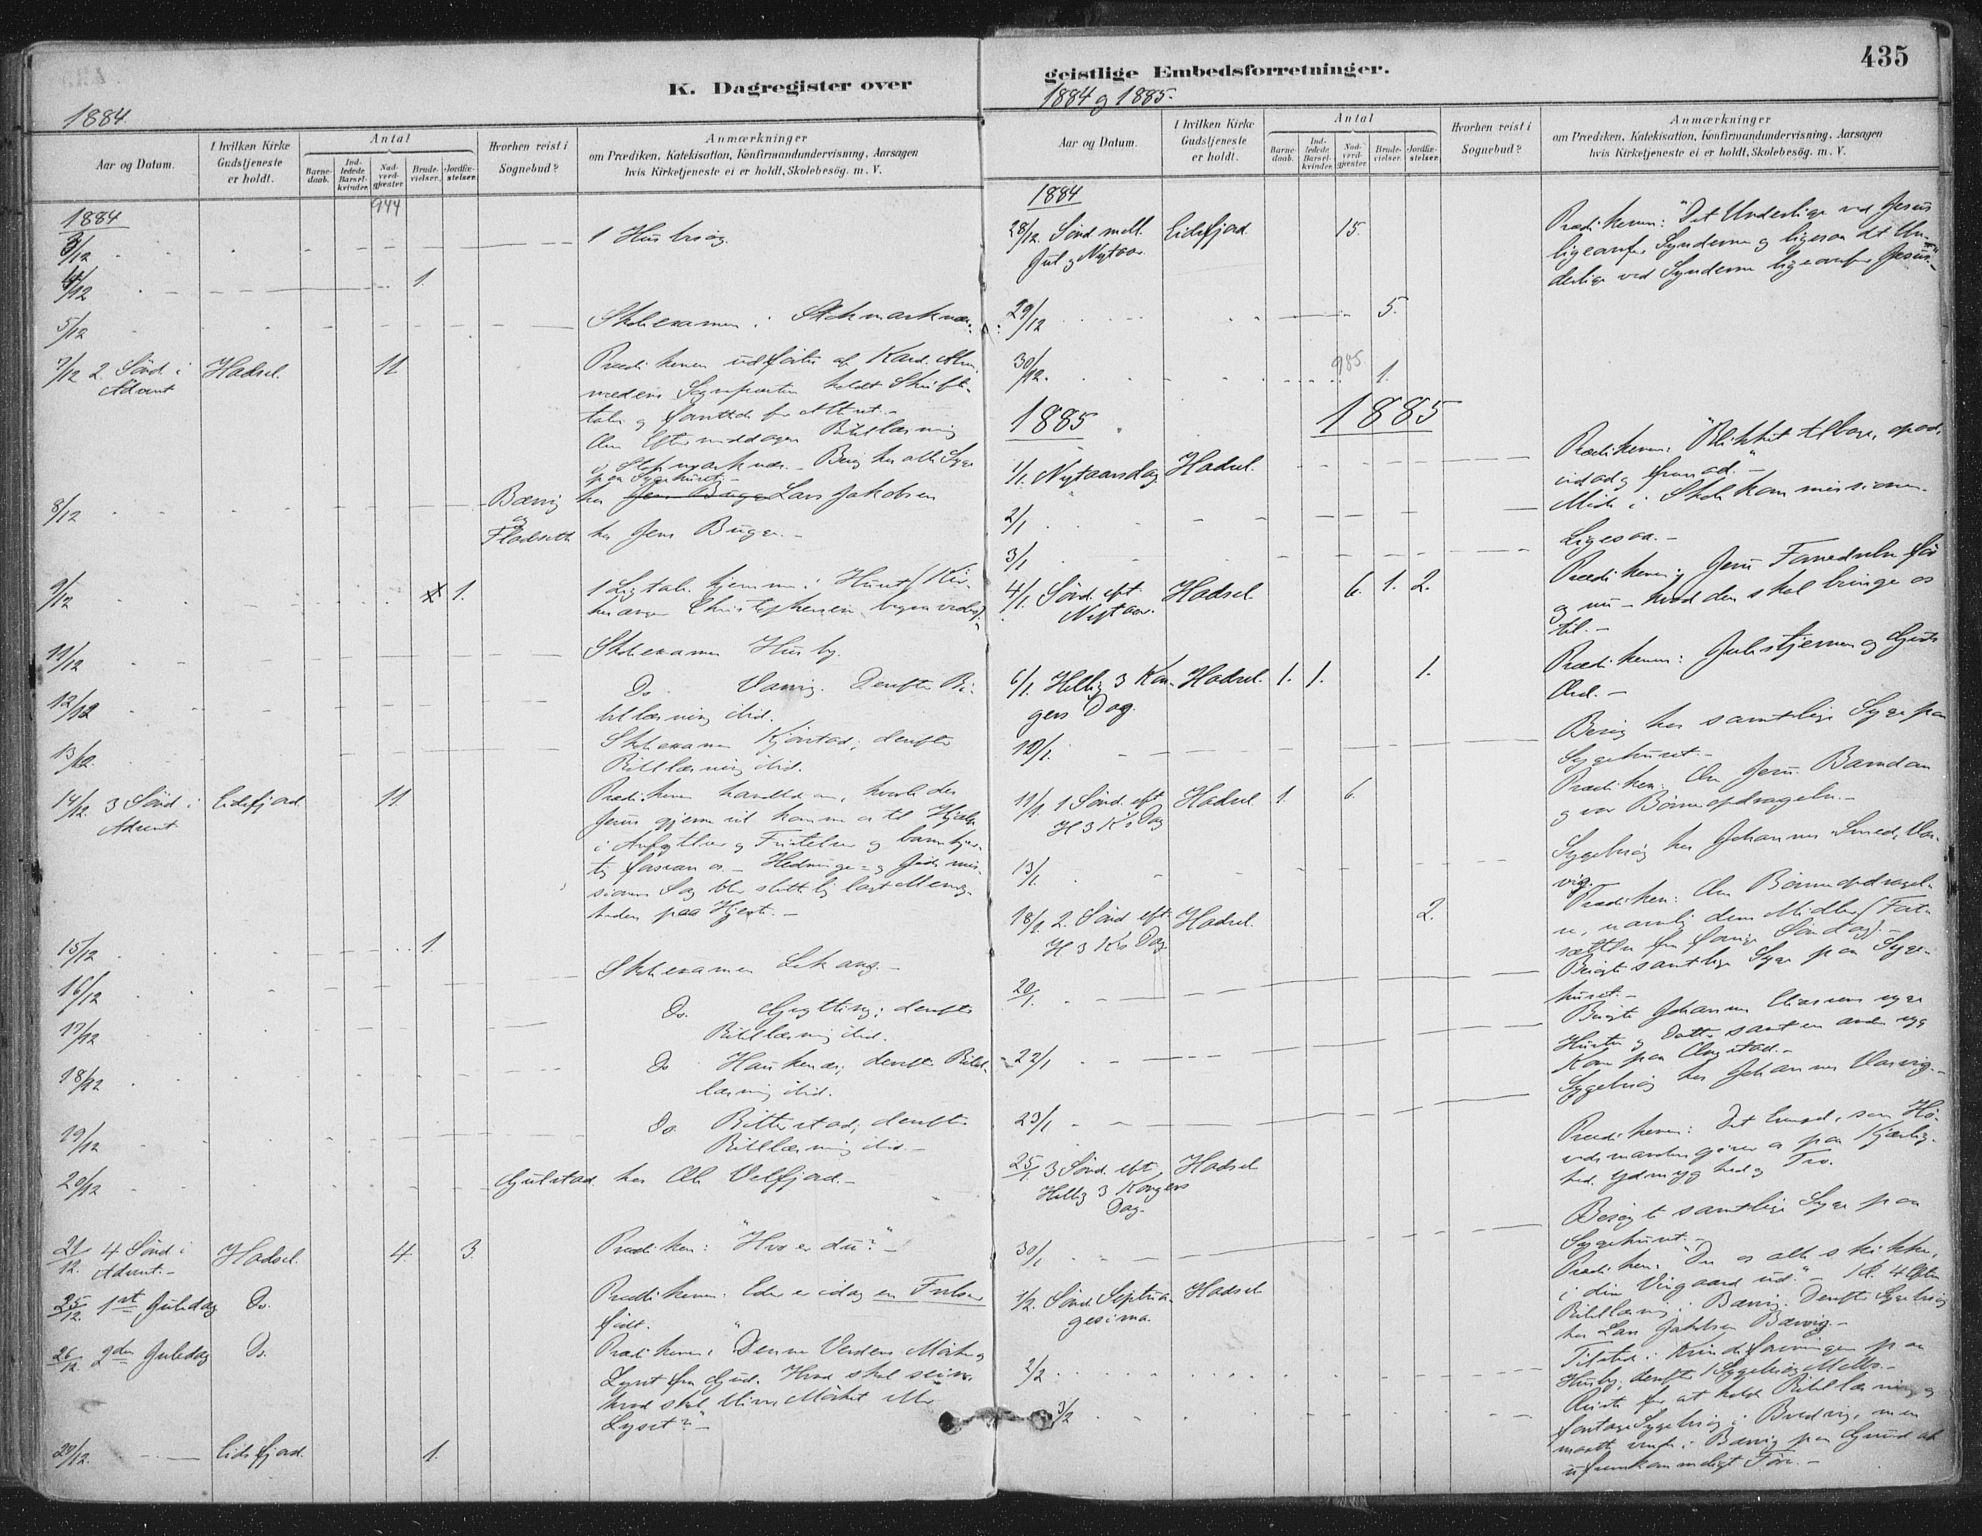 SAT, Ministerialprotokoller, klokkerbøker og fødselsregistre - Nordland, 888/L1244: Ministerialbok nr. 888A10, 1880-1890, s. 435